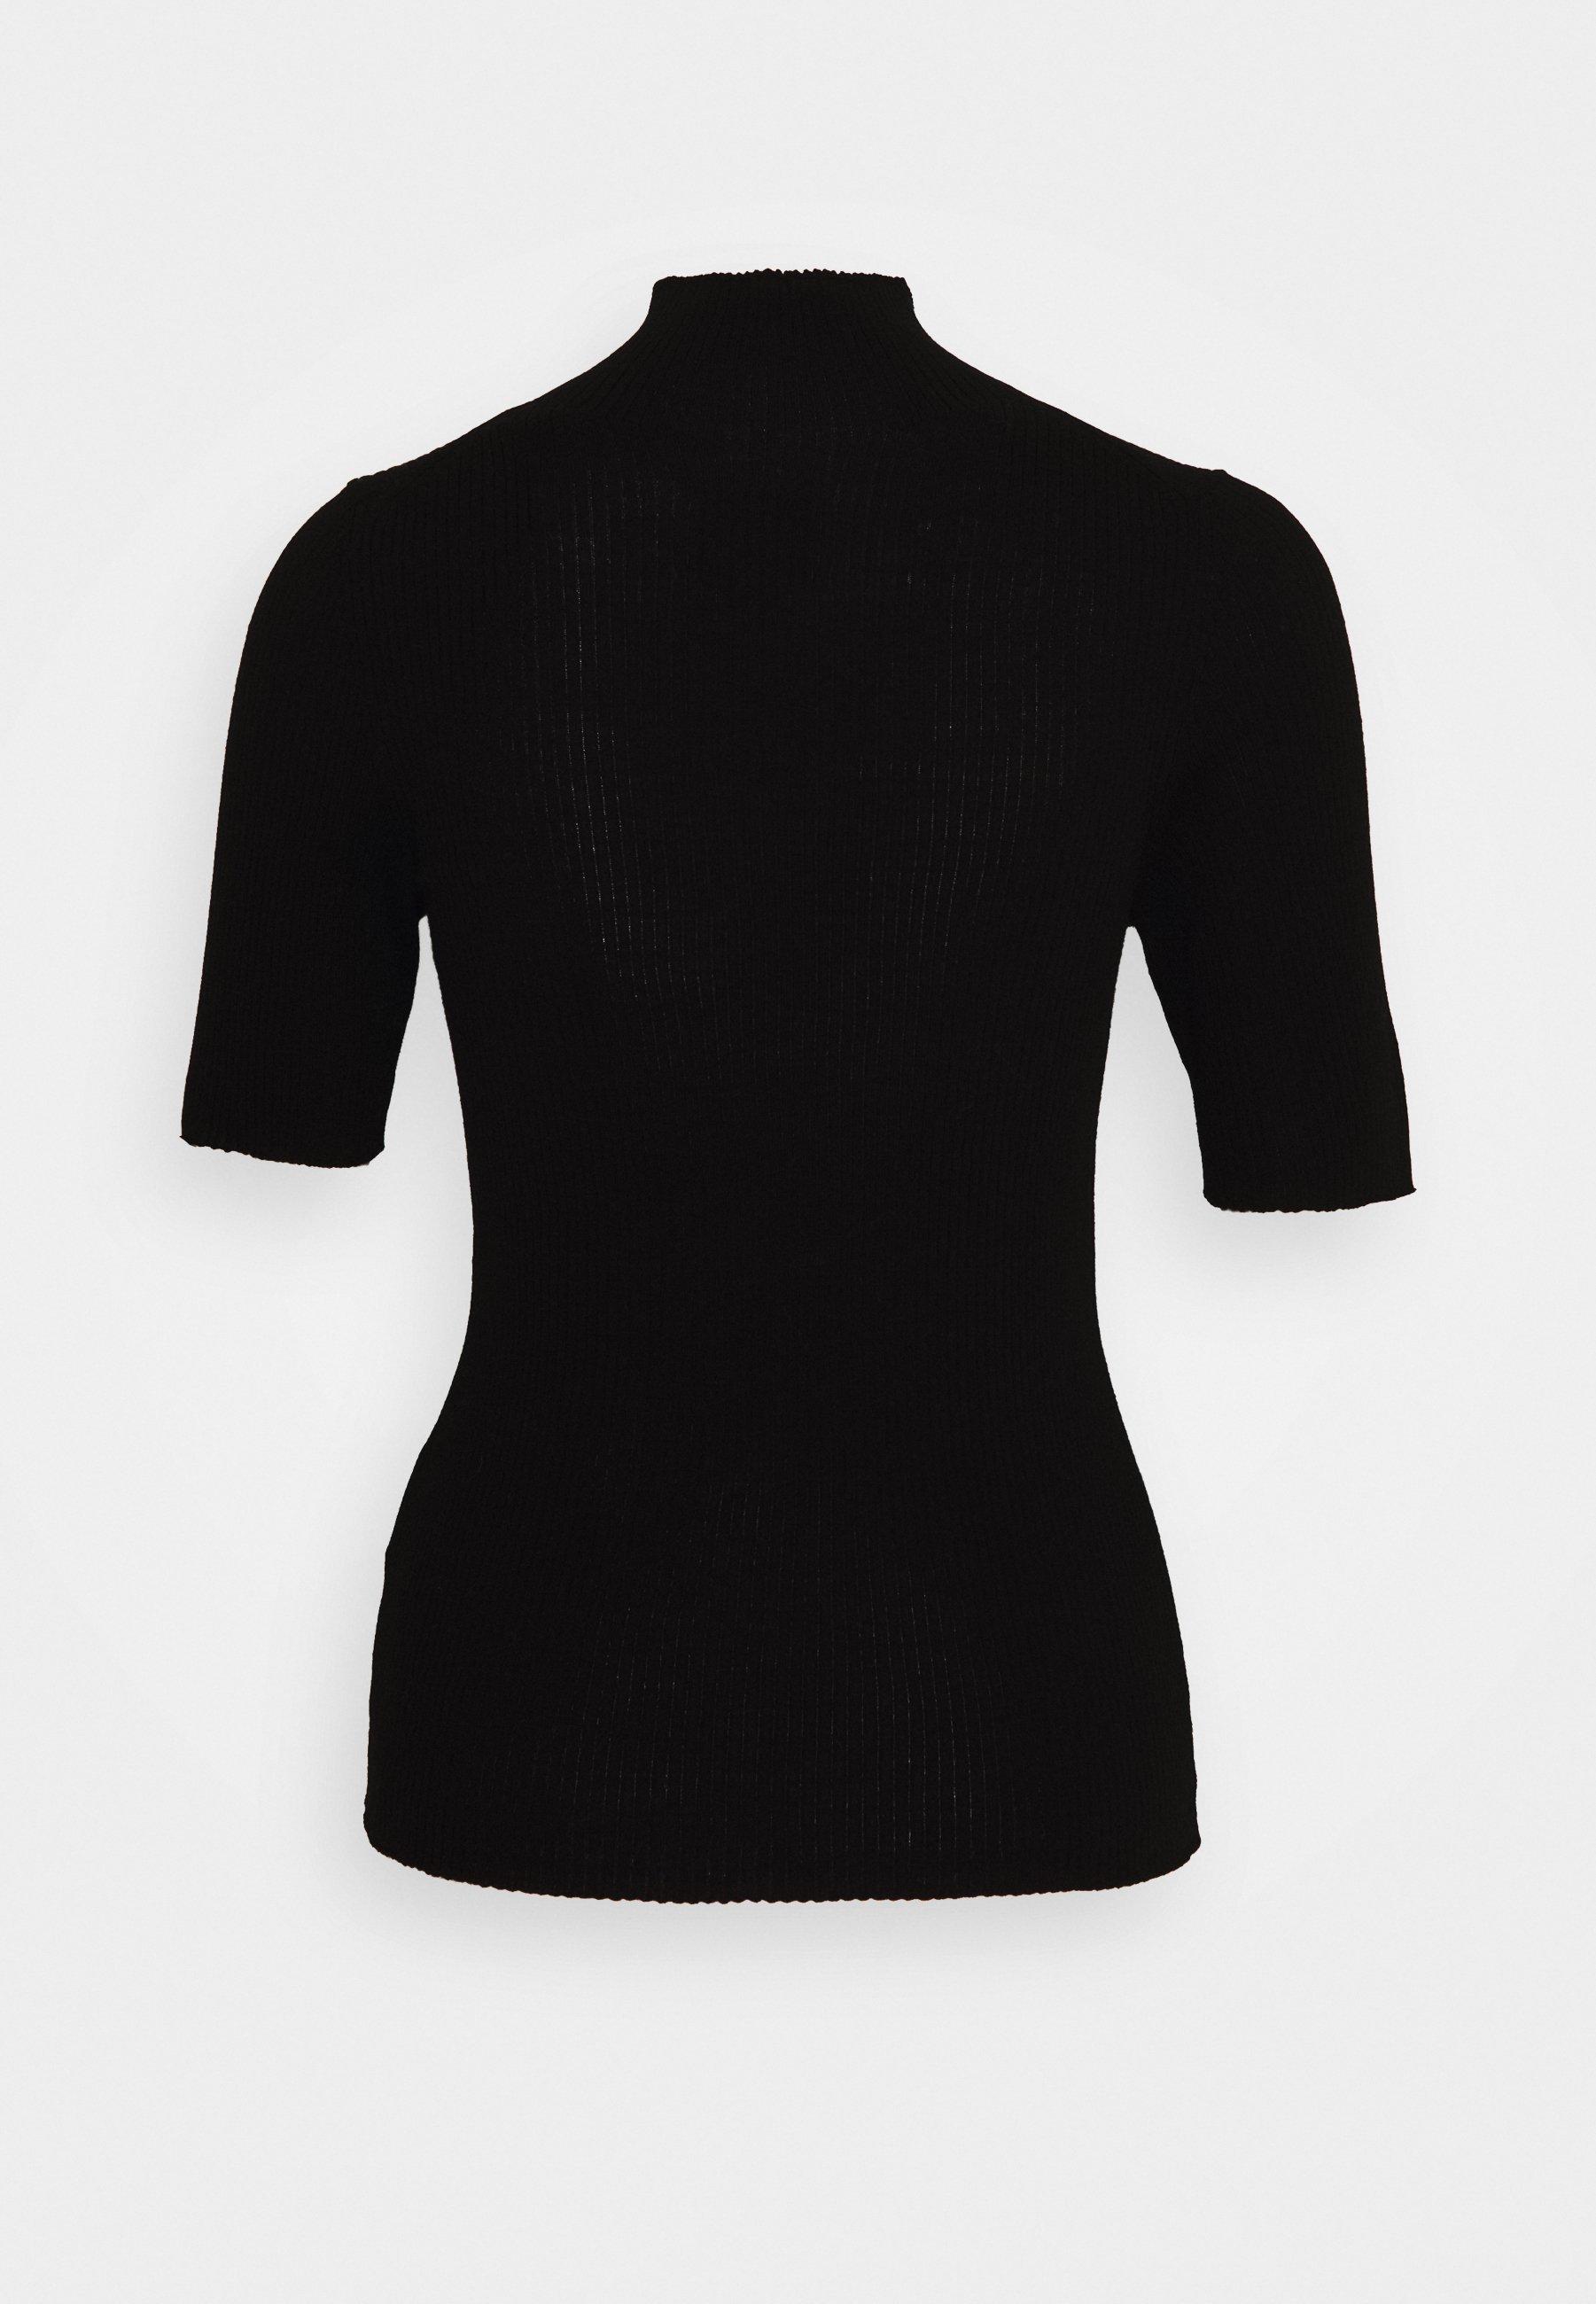 Marc O'polo Pure Brisbane Shortsleeve Turtleneck - T-shirts Med Print Black/svart